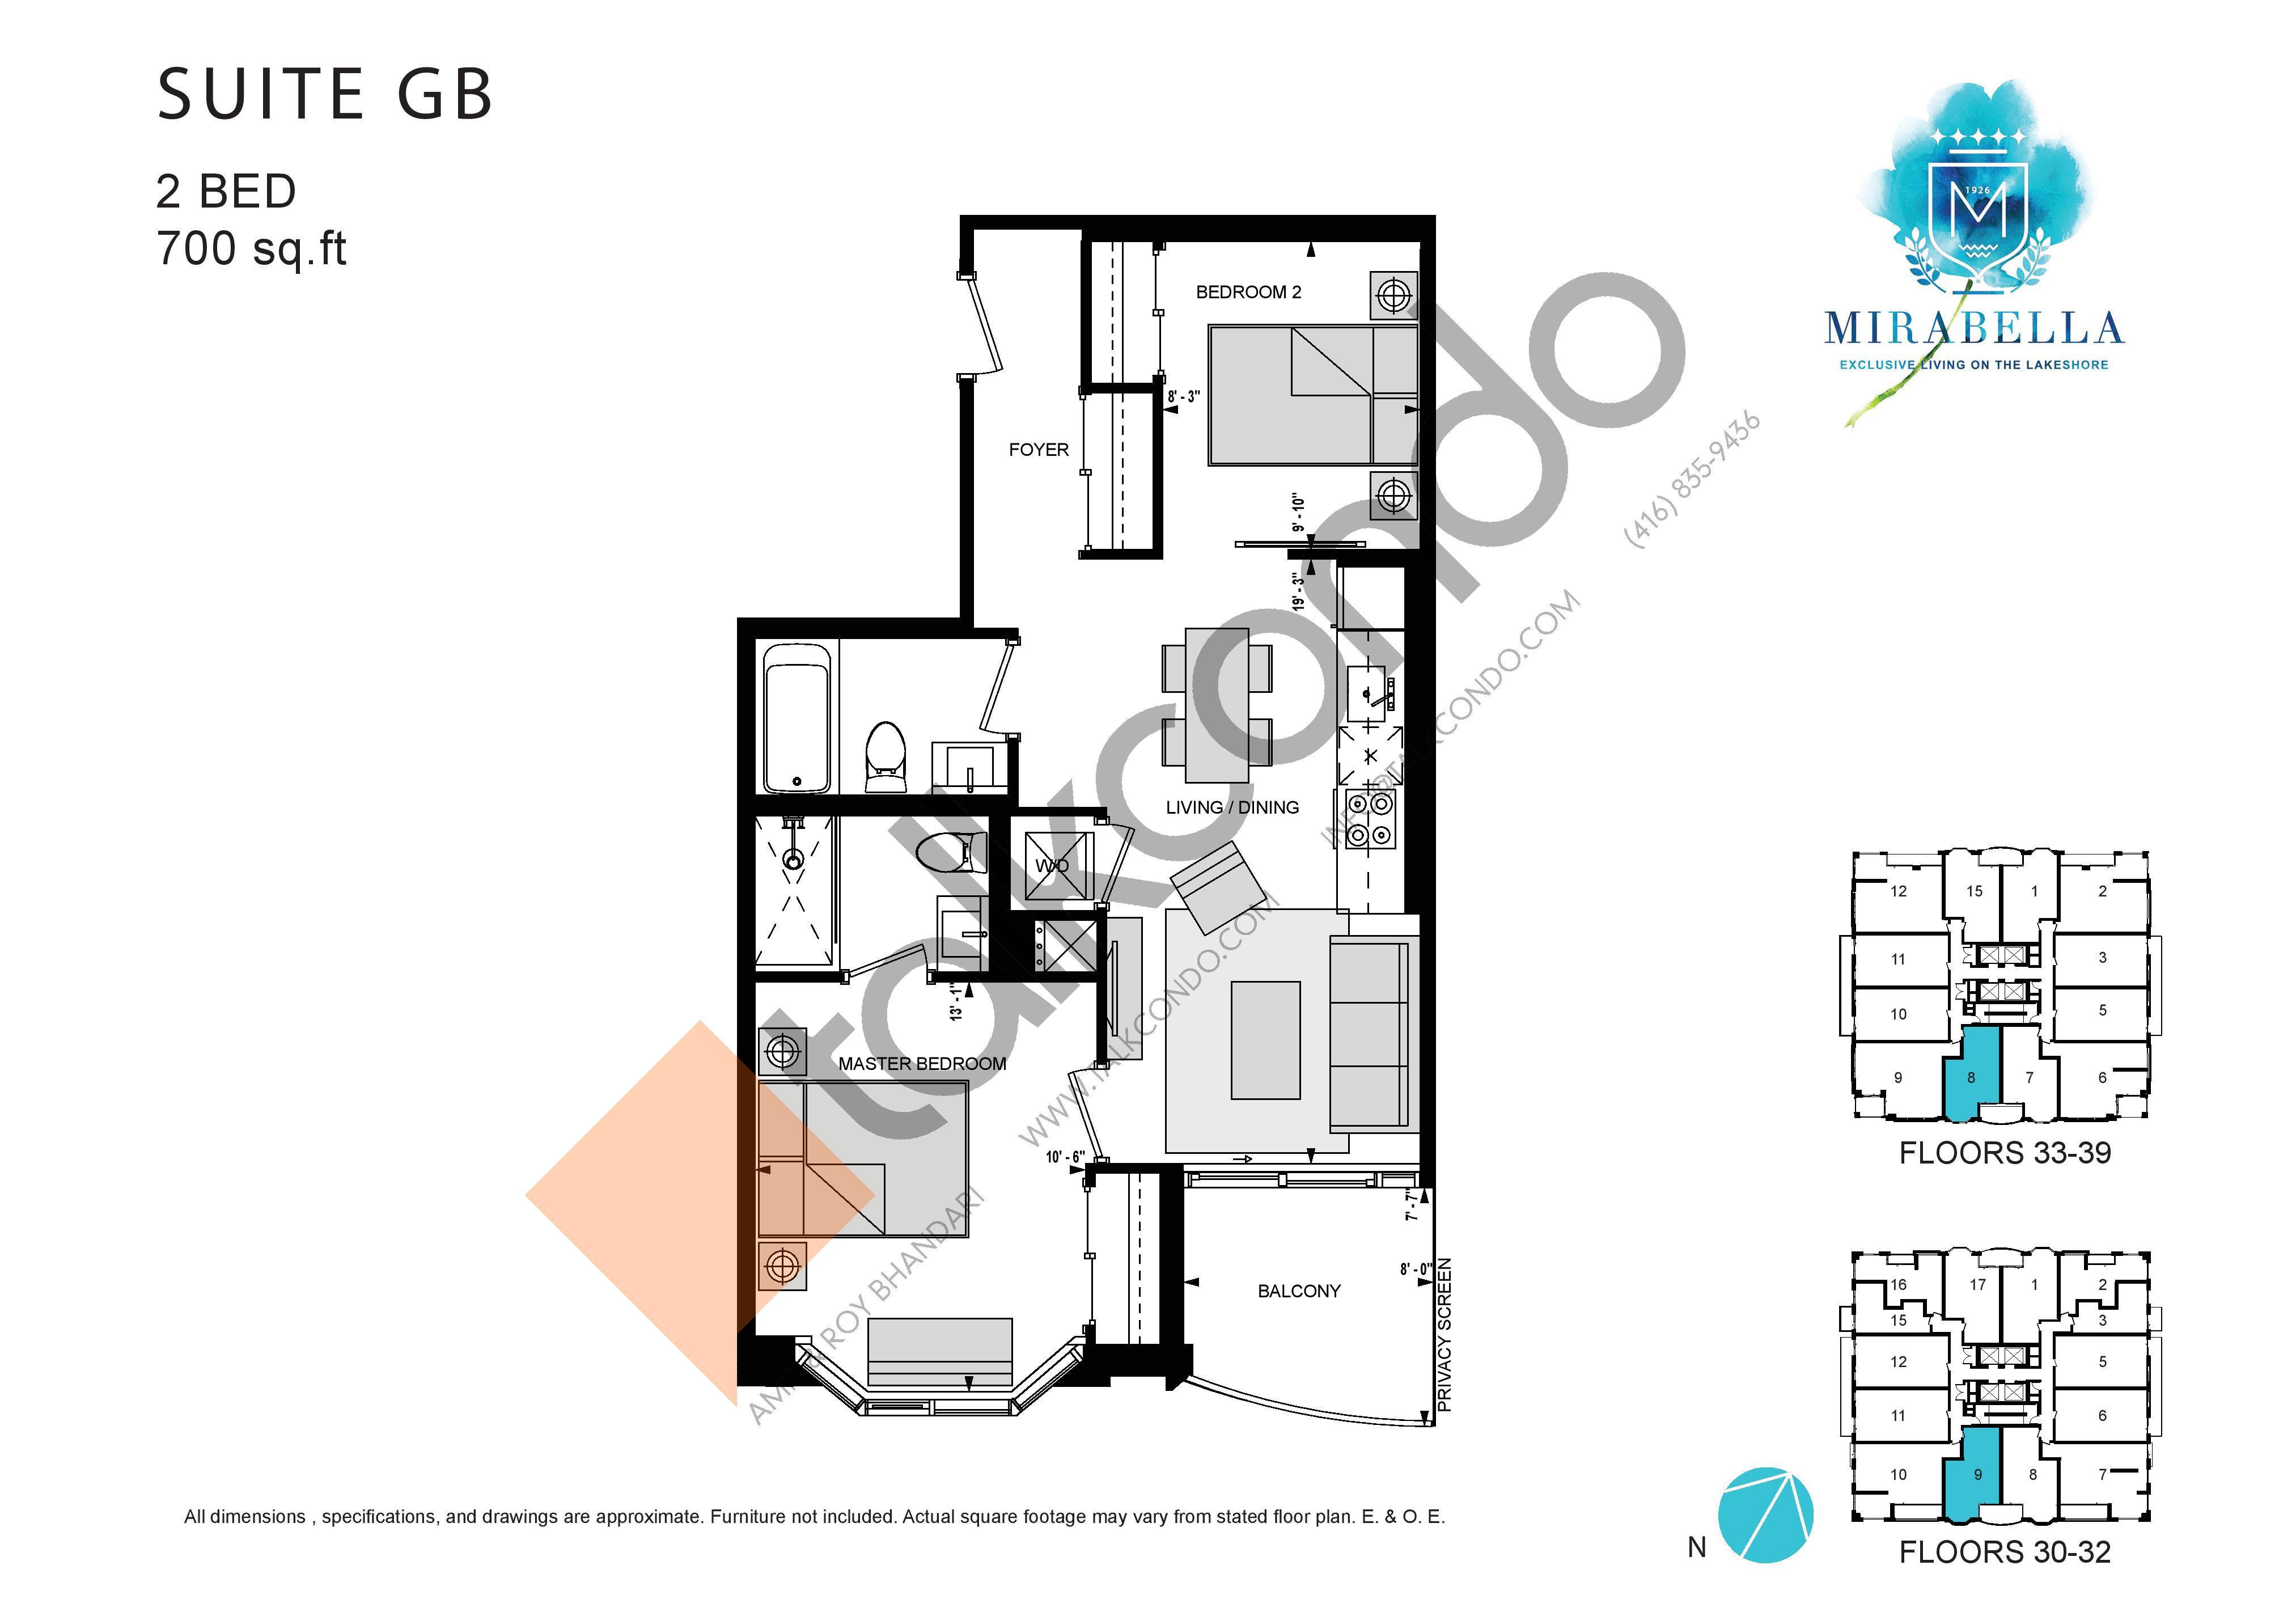 Suite GB Floor Plan at Mirabella Luxury Condos East Tower - 700 sq.ft